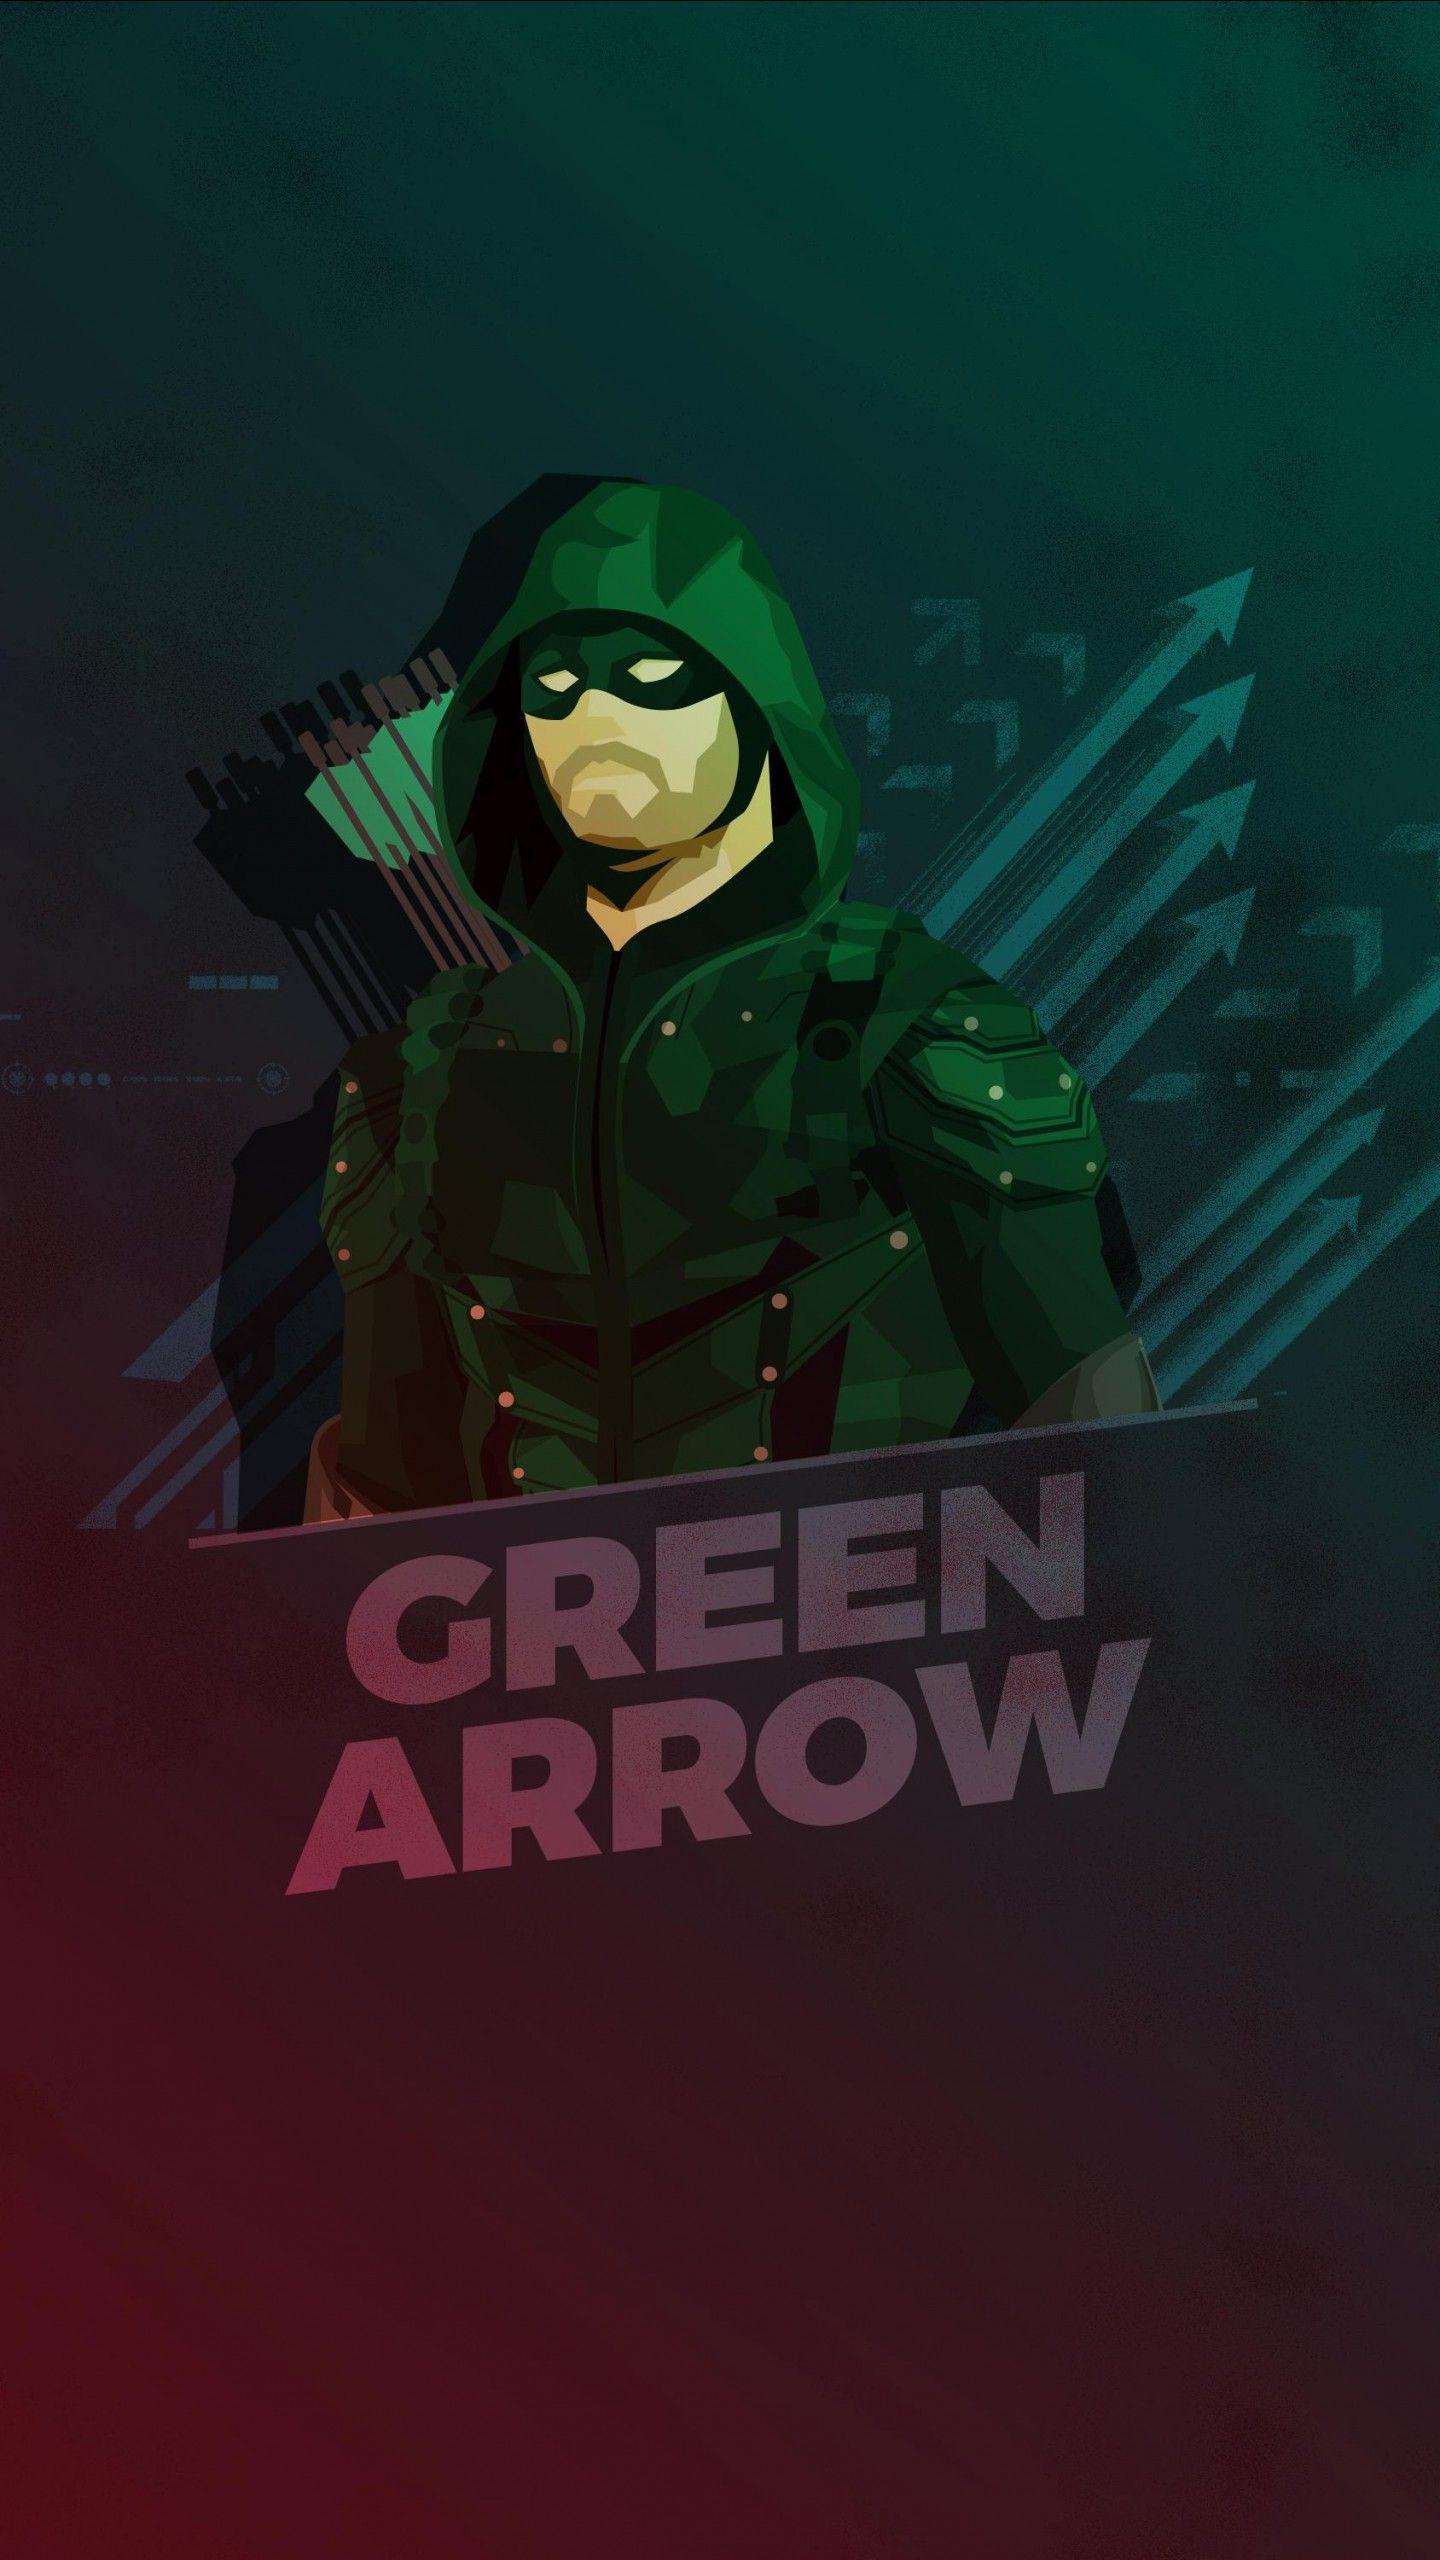 Misc Green Arrow Minimal Artwork Hd Wallpapers Green Arrow Wallpaper Iphone Wallpaper